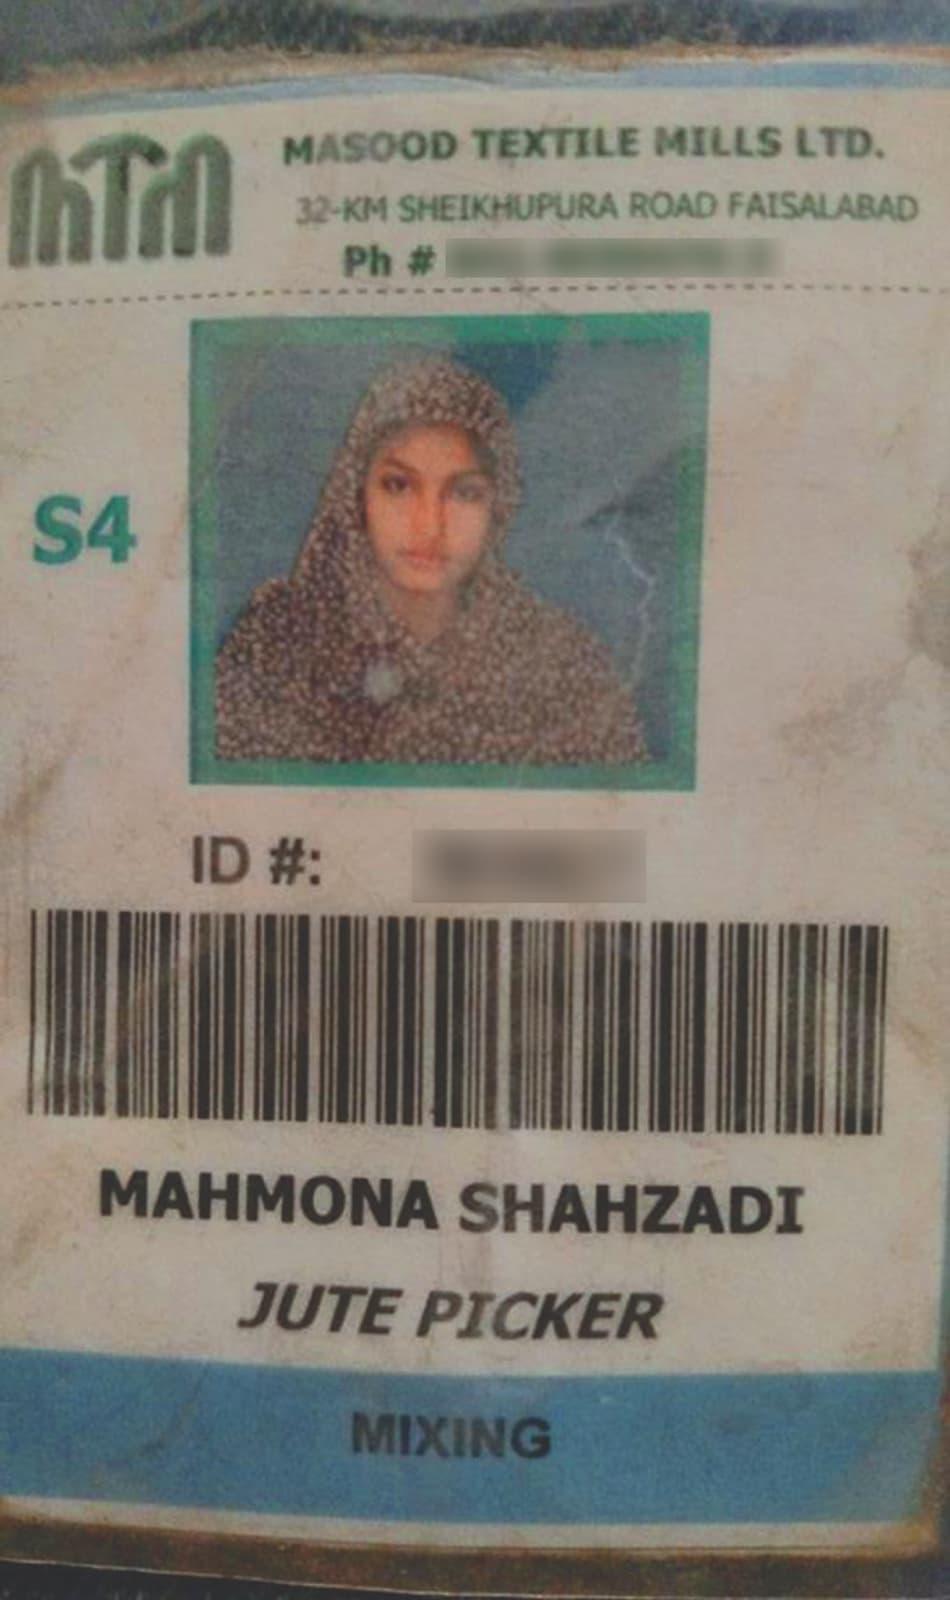 Maimoona Shahzadi's employee card. Credit: Bilal Karim Mughal